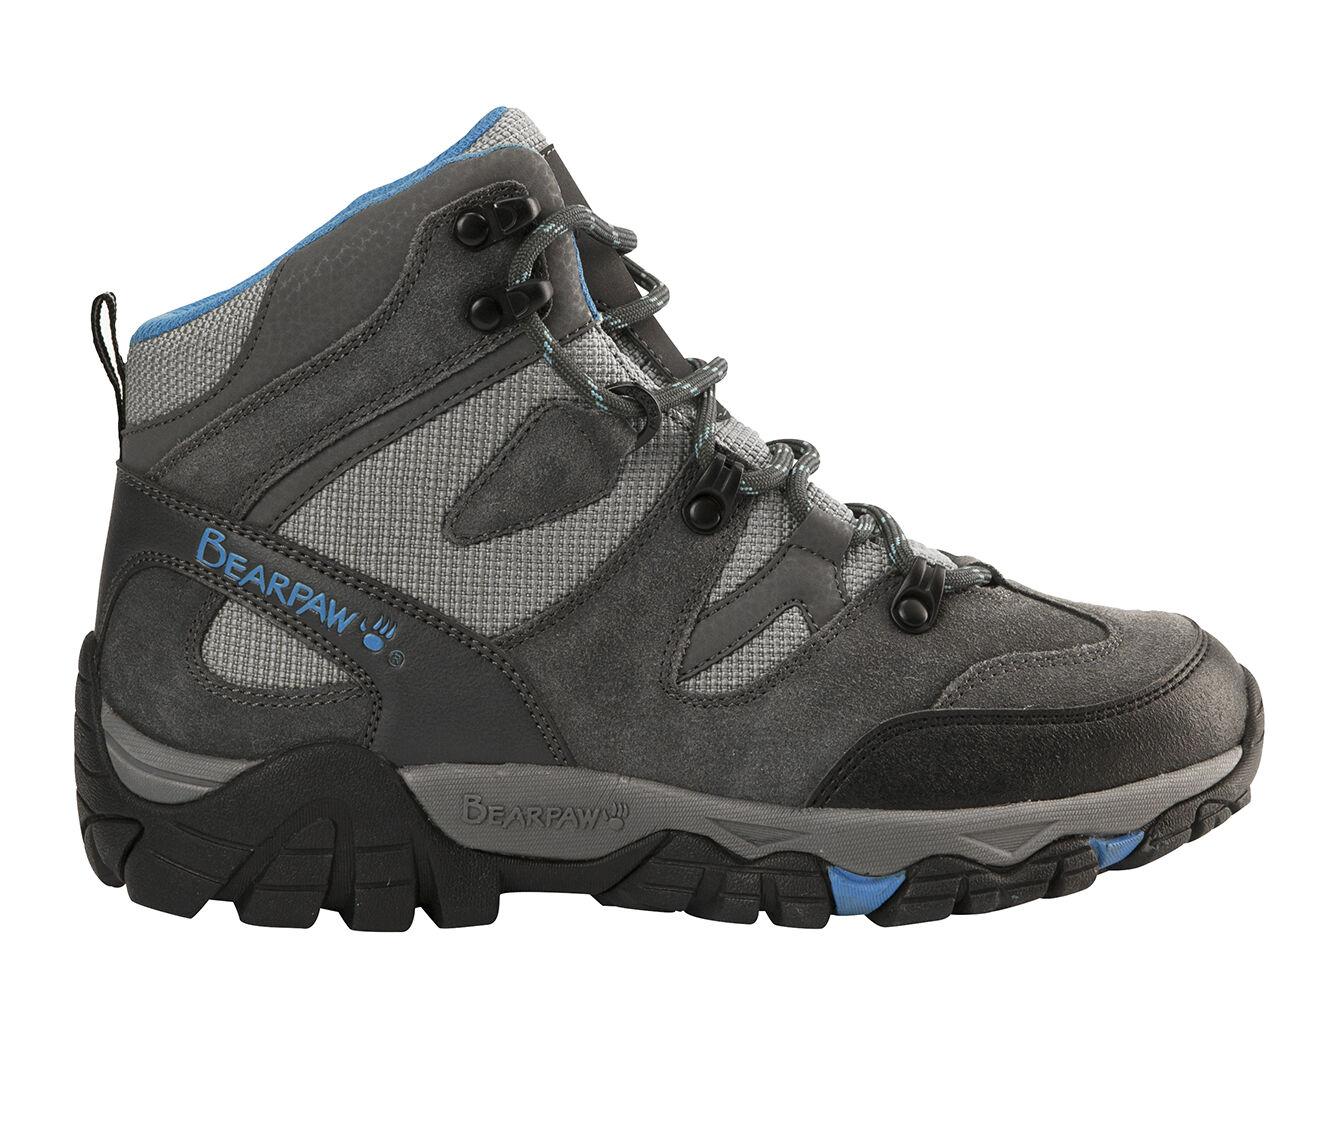 Women's Bearpaw Corsica Hiking Boots